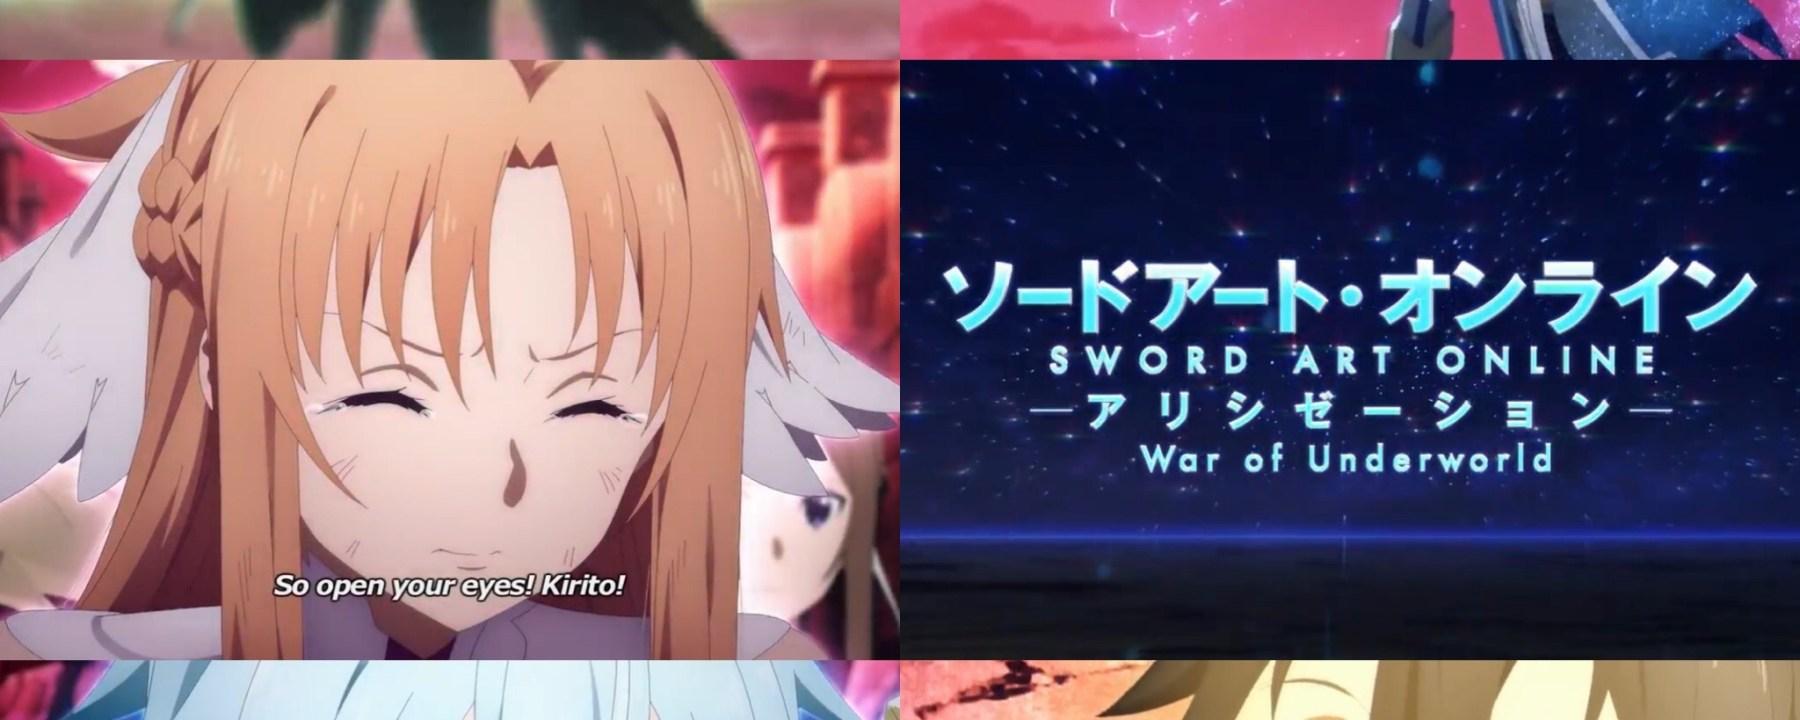 Sword Art Online: Alicization- War of Underworld